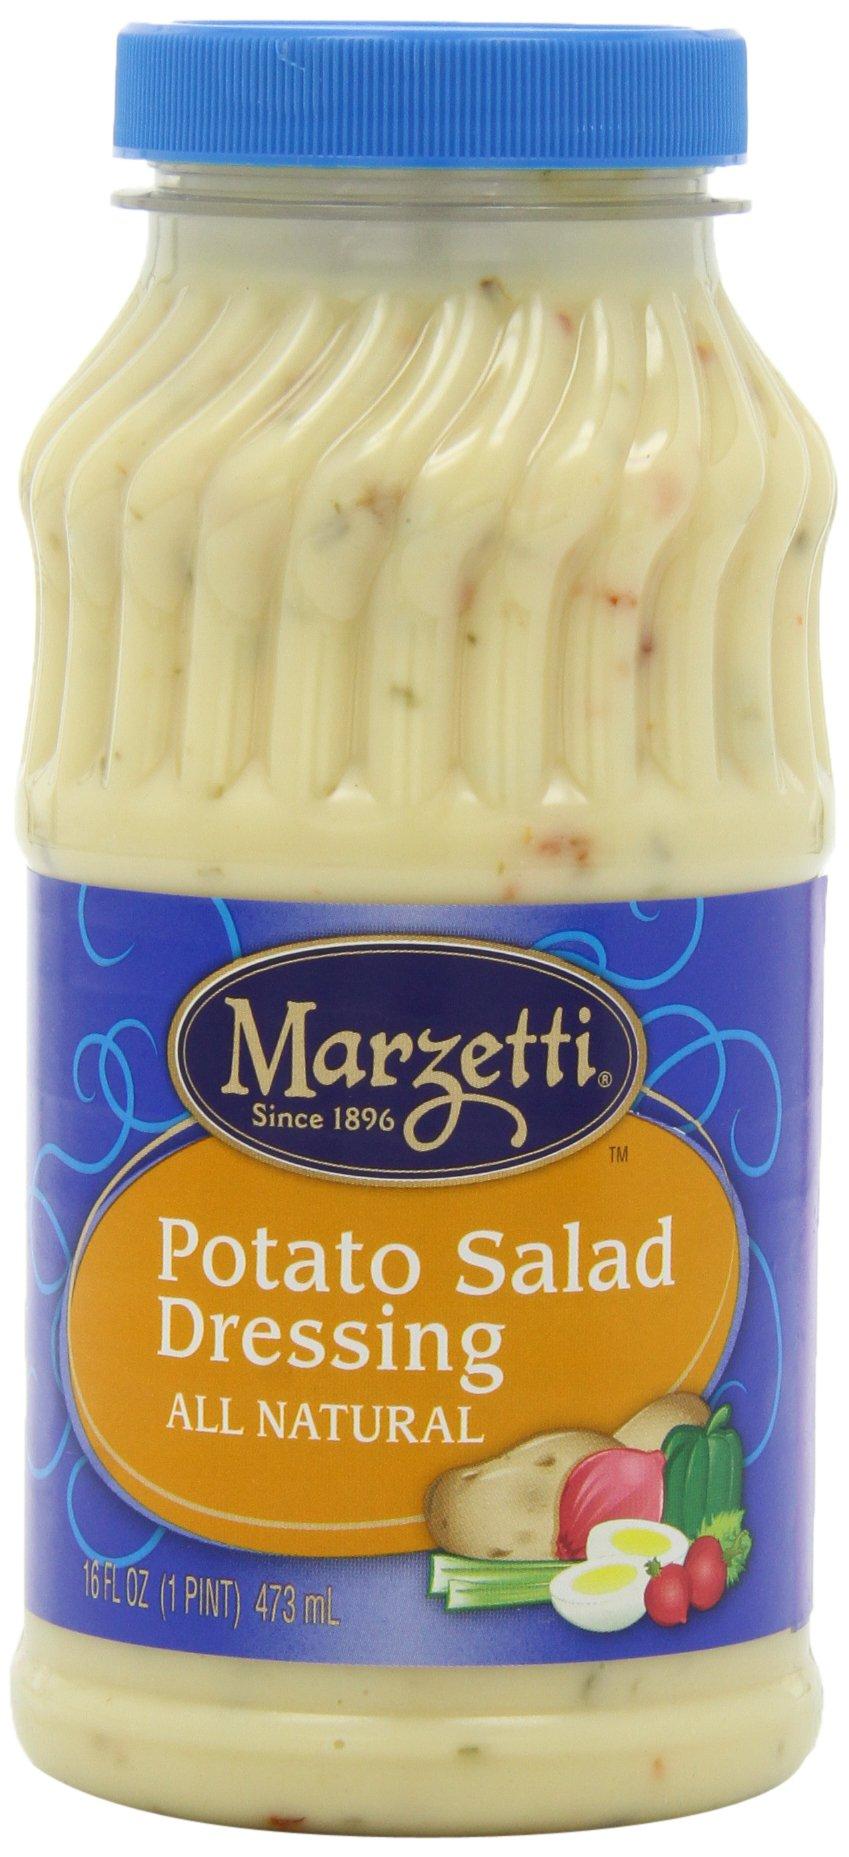 Marzetti Potato Salad Dressing, 16-Ounce Jars (Pack of 6)